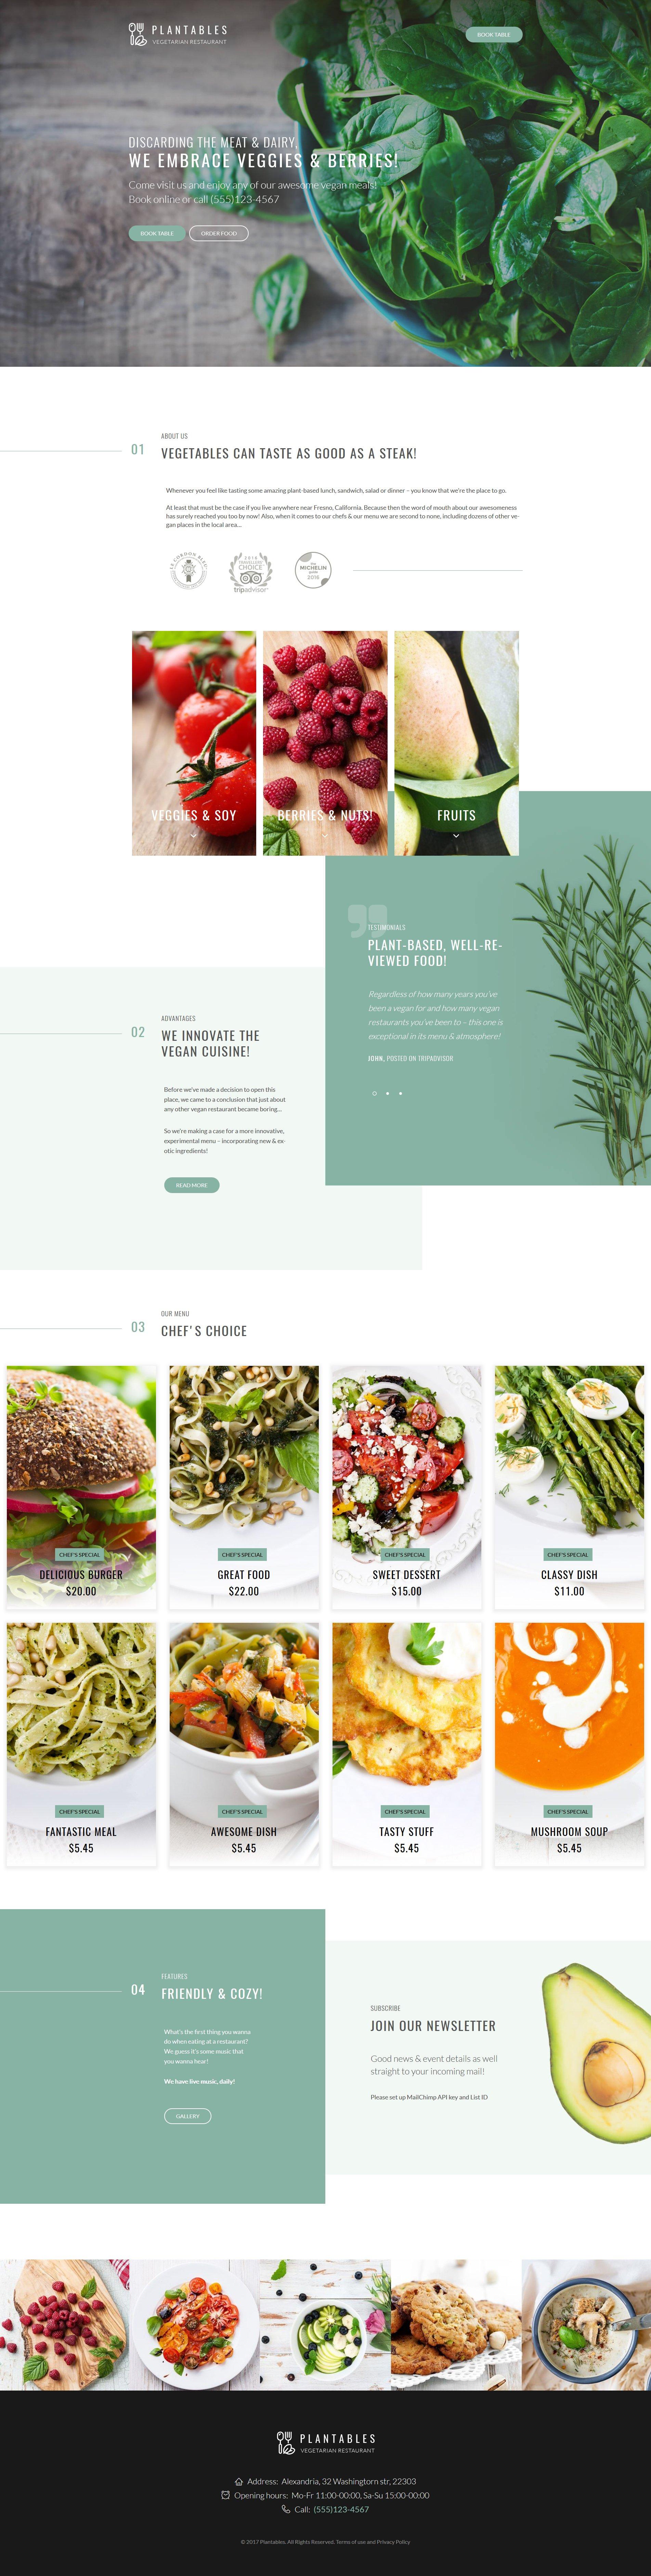 """Plantables - Vegetarian Restaurant"" thème WordPress adaptatif #64052"